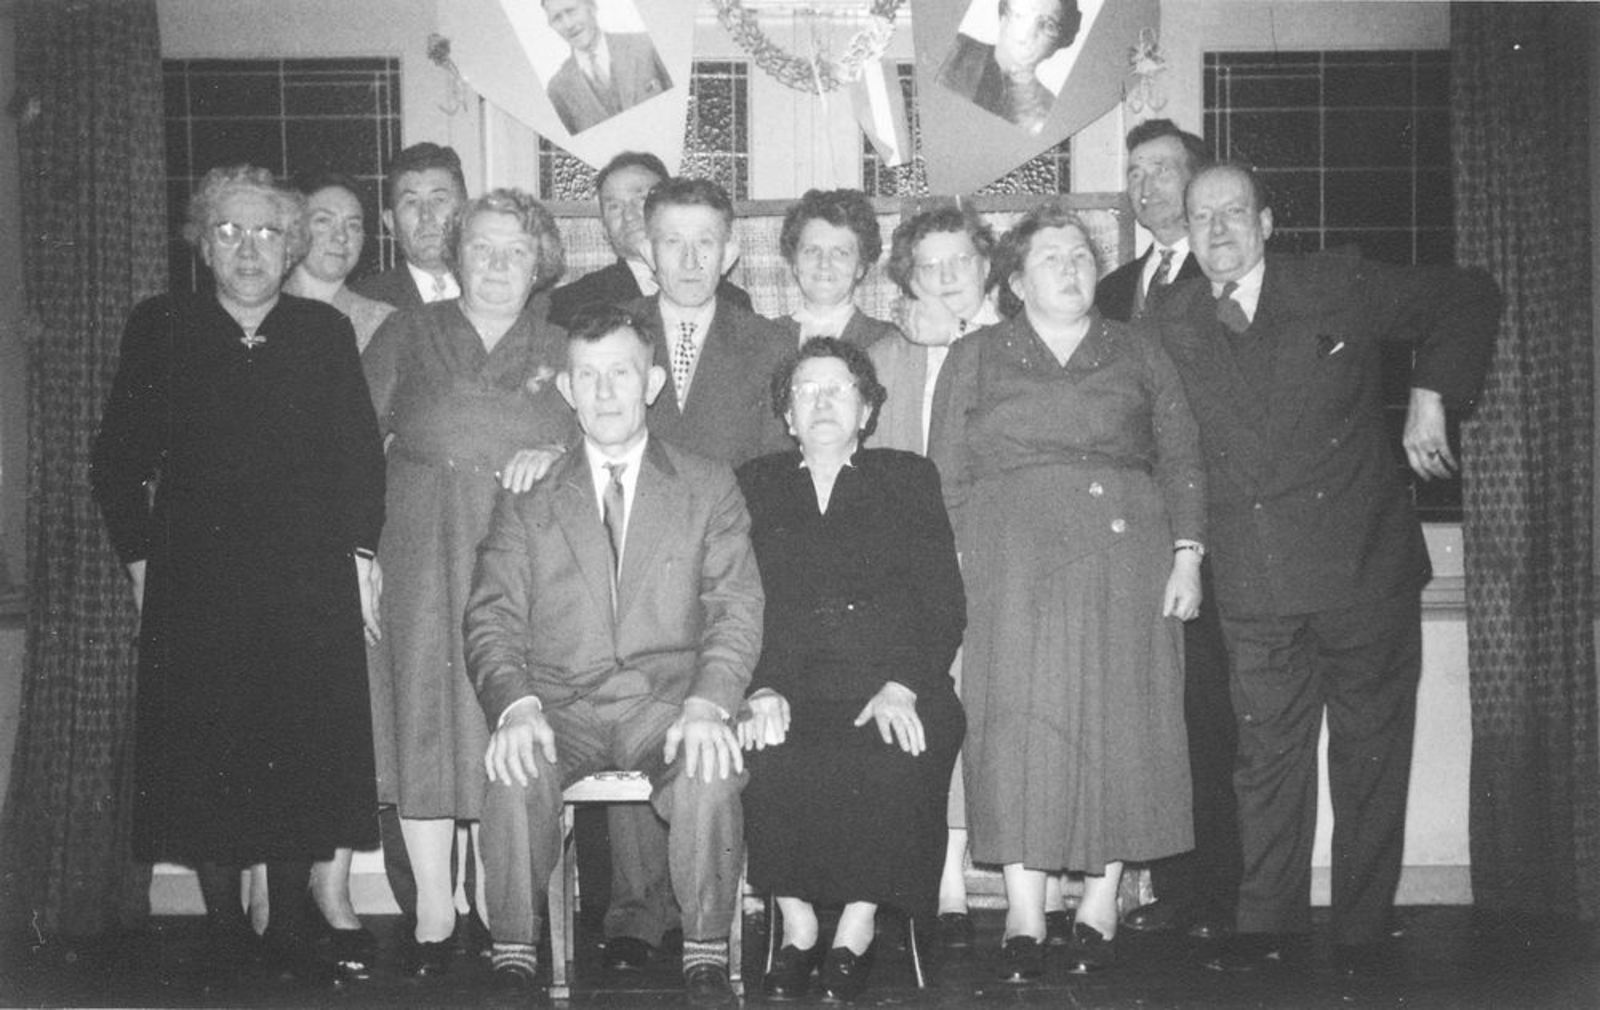 Dam-Stroomer Fam 1956 Onbekend Trouwerij 02